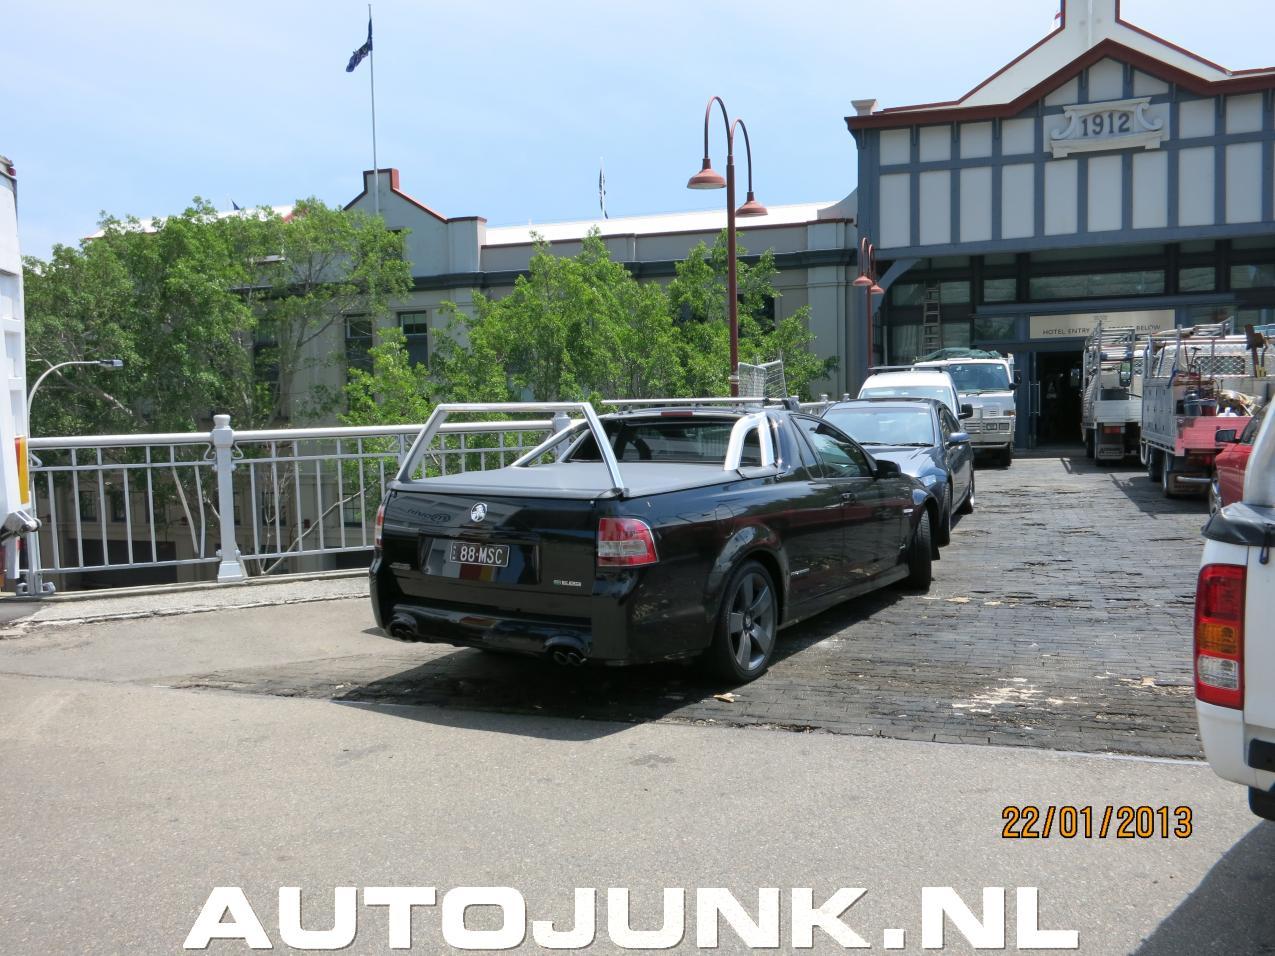 Holden Ute foto's » Autojunk.nl (87643)